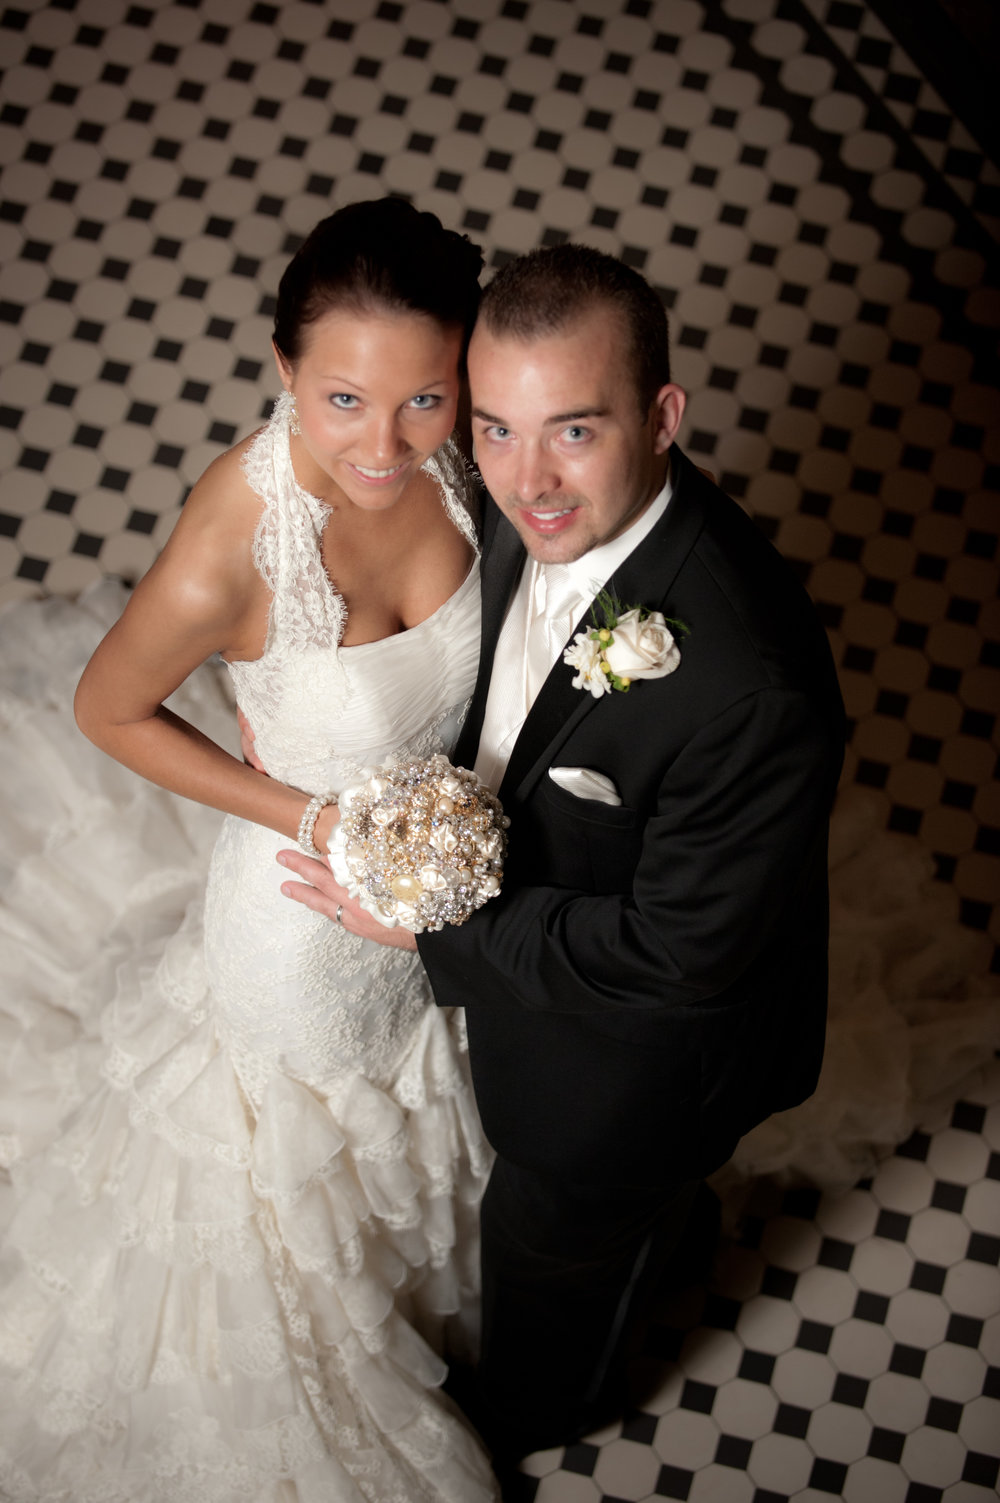 Jessica and Kurtis Wedding 0198.jpg